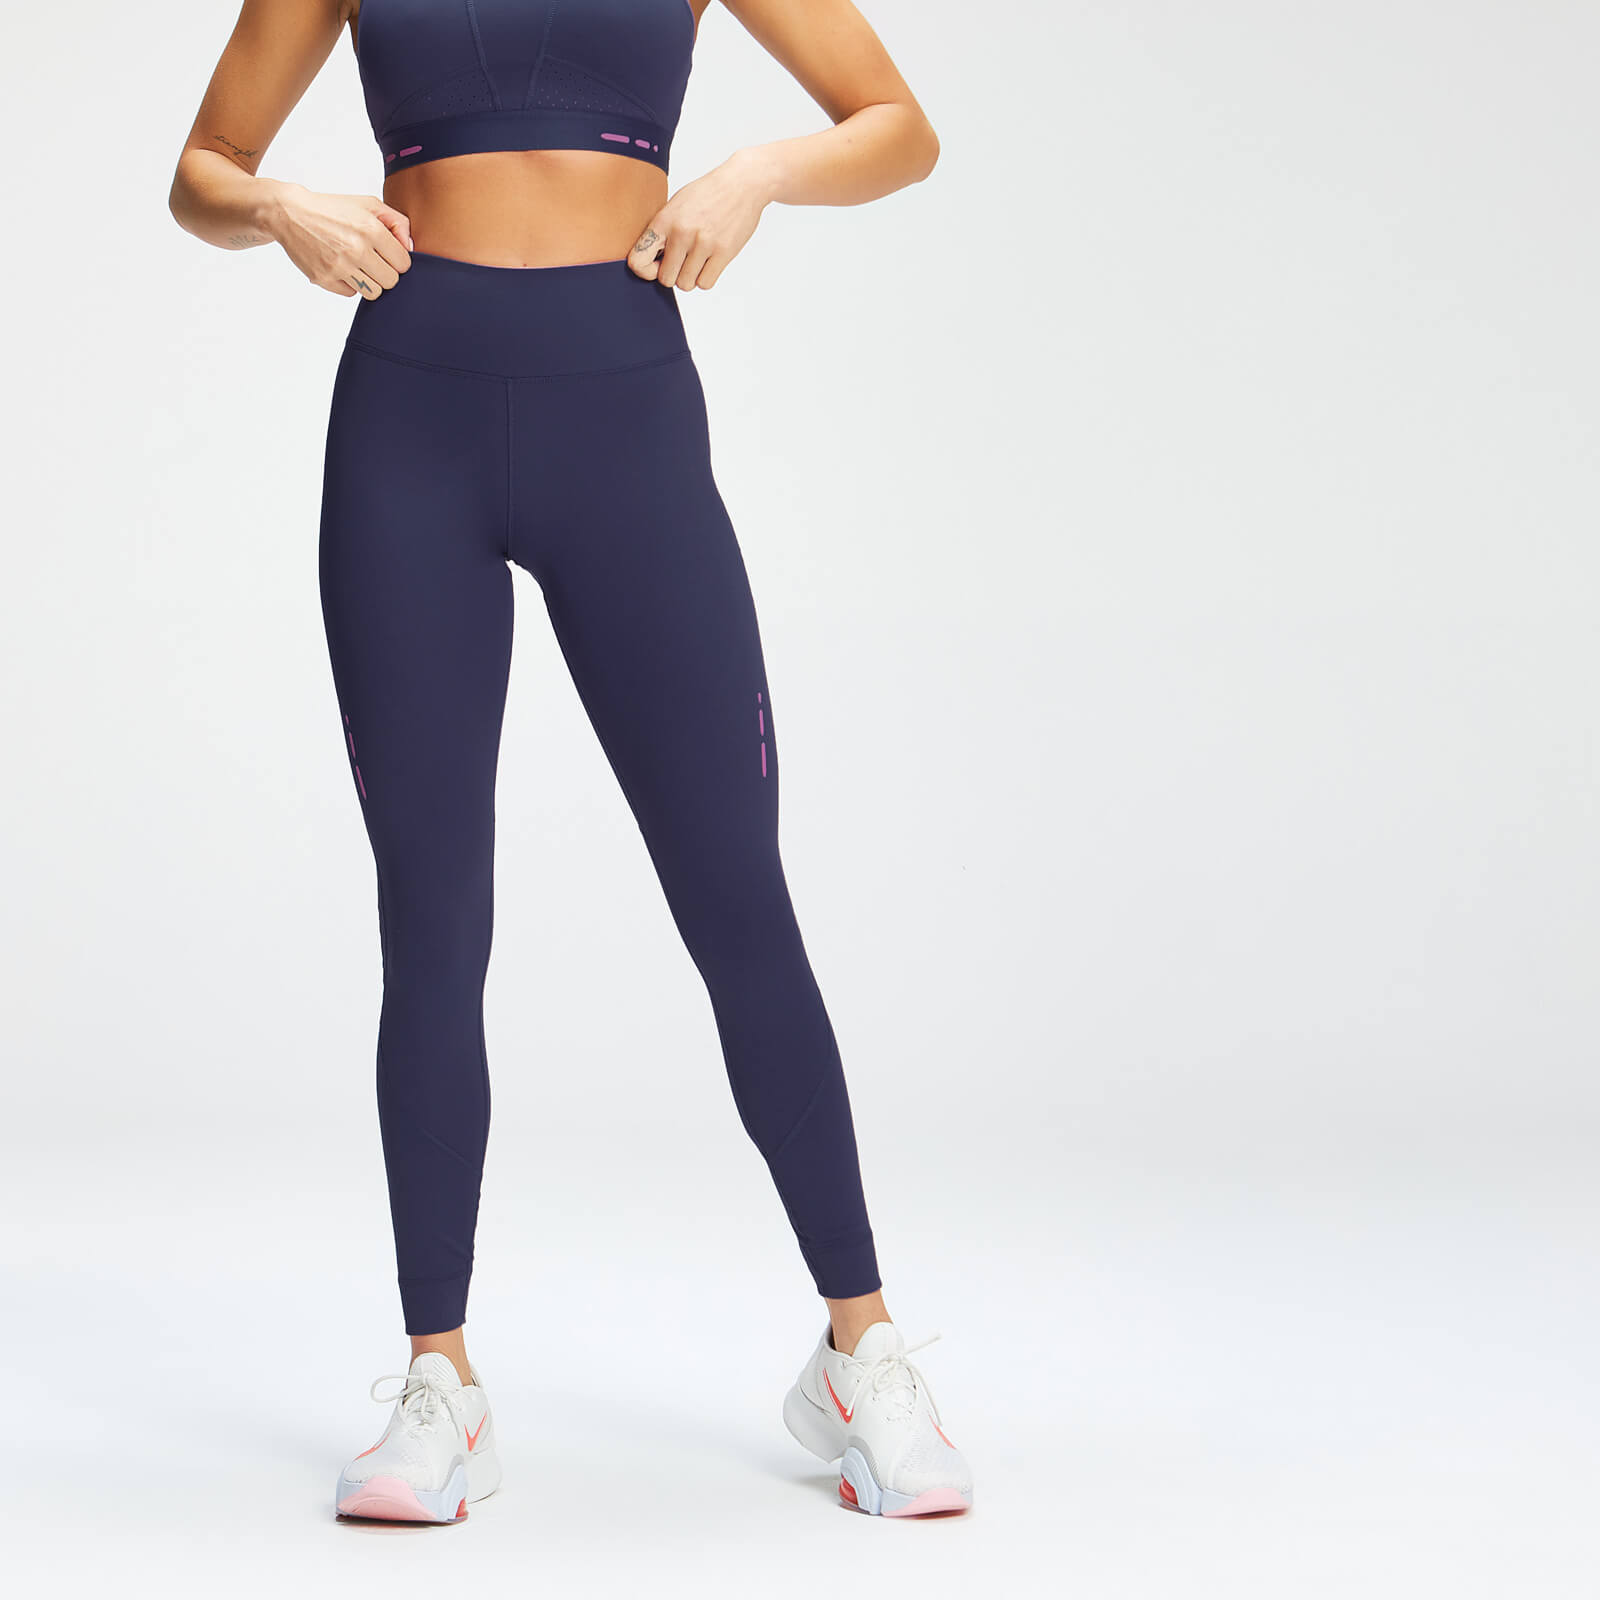 Купить MP Women's Power Ultra Leggings - Galaxy Blue - L, Myprotein International